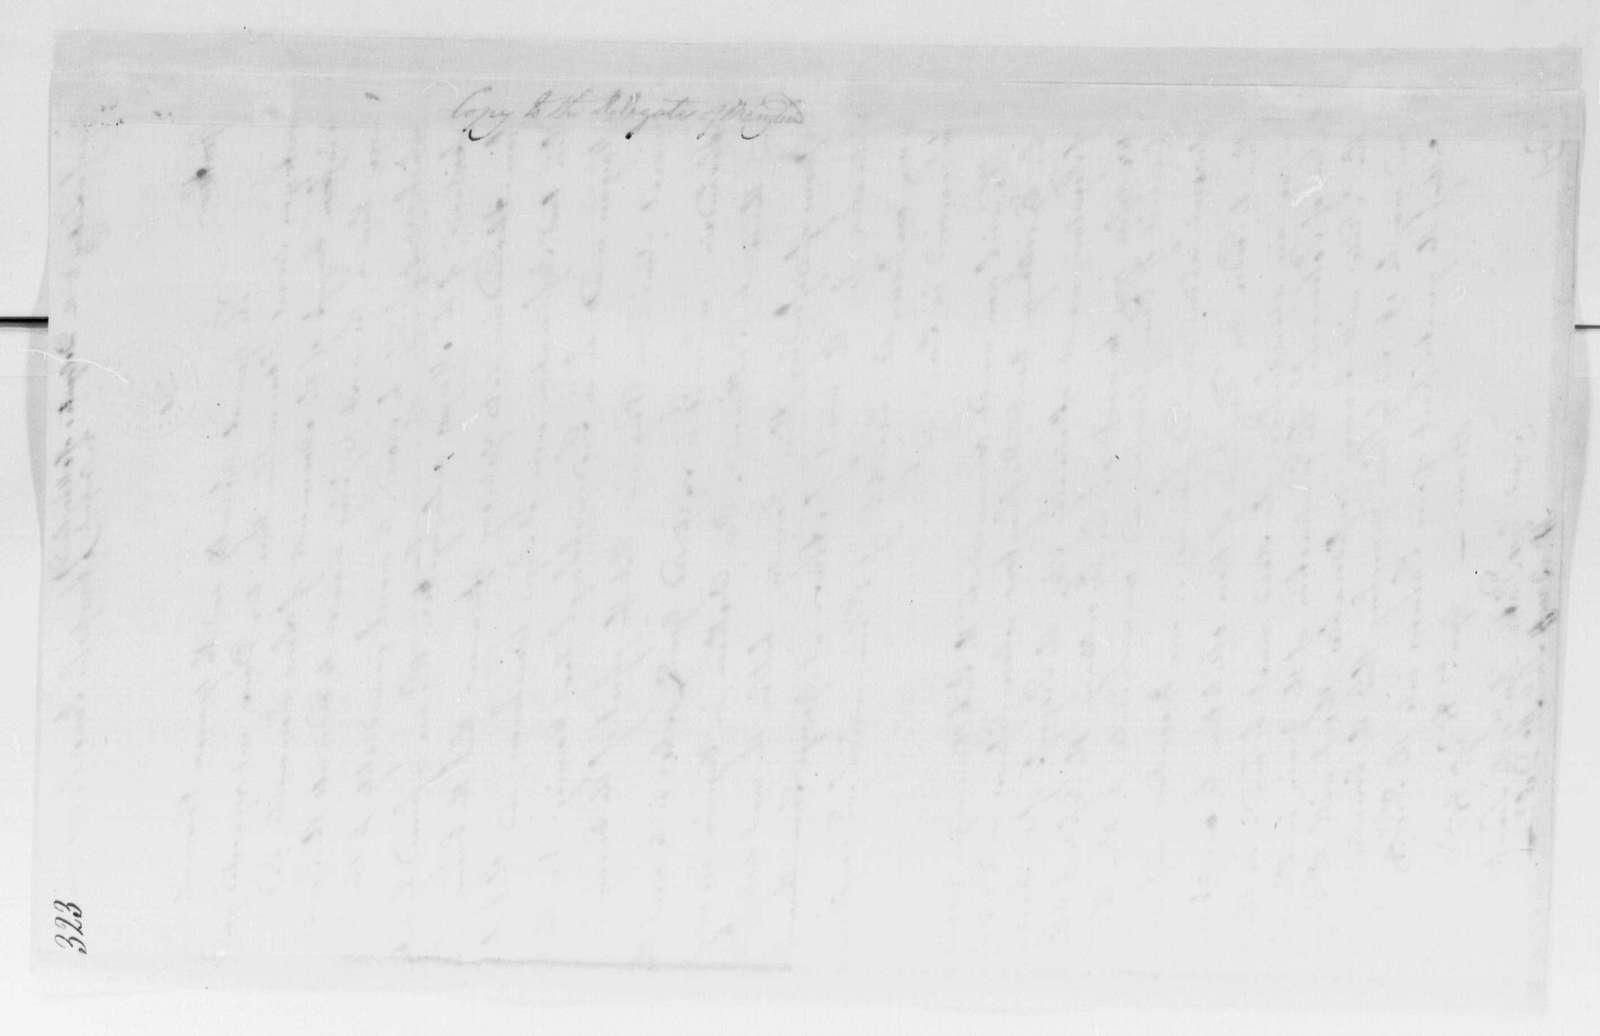 George Washington Papers, Series 4, General Correspondence: Maryland Legislature to Maryland Delegates to Congress, June 1, 1781